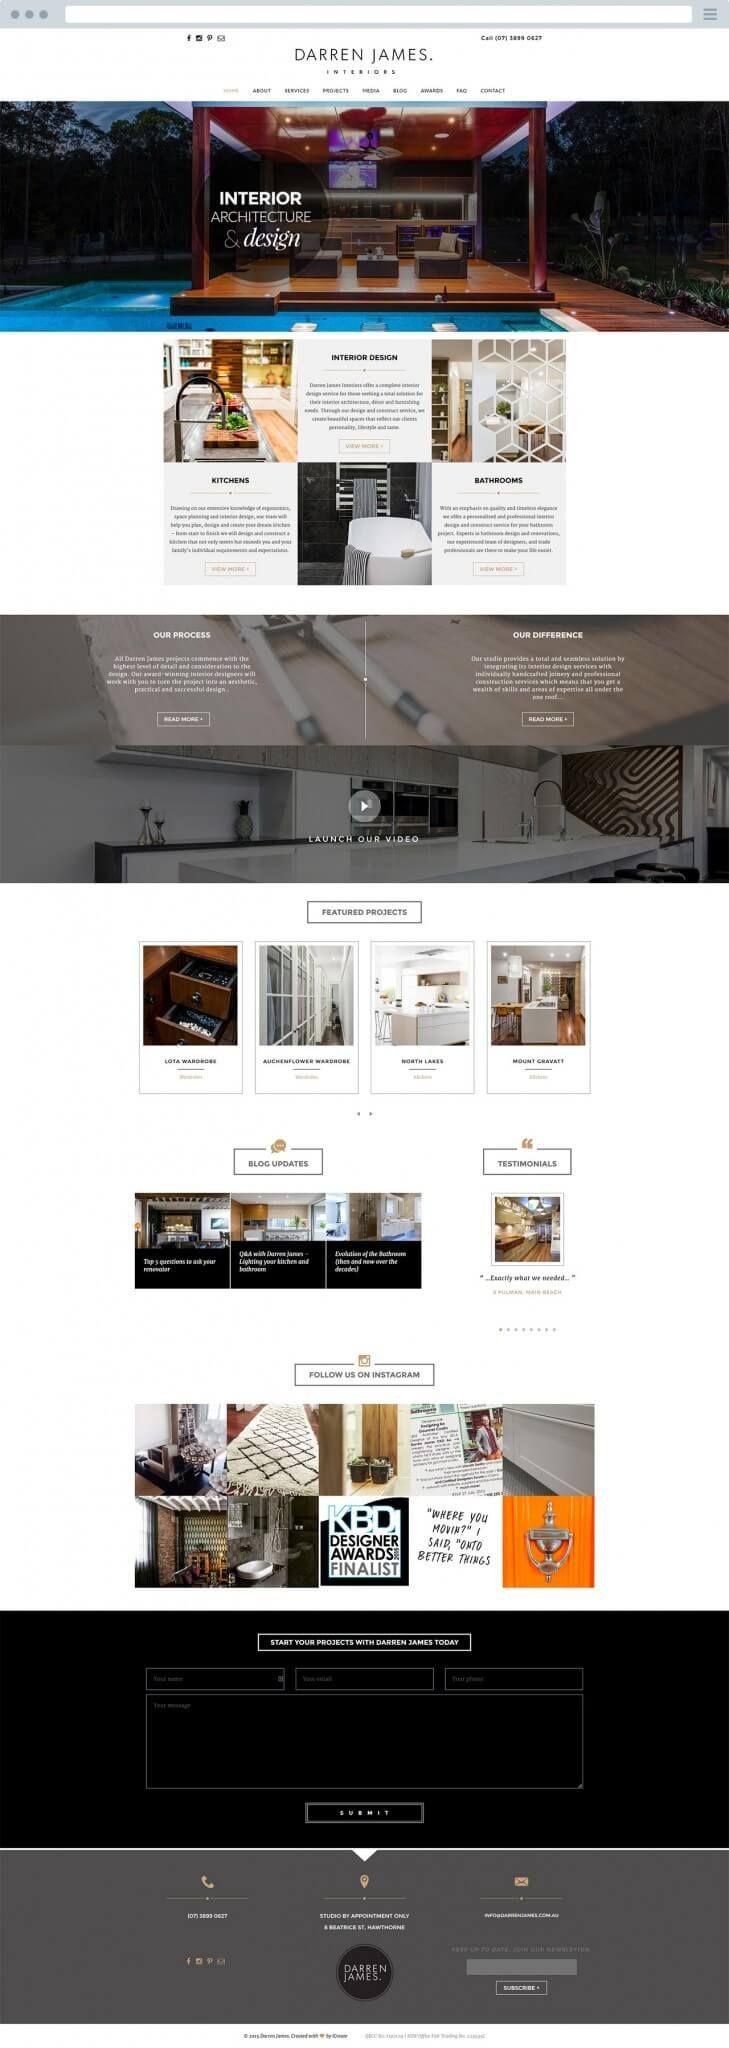 Darren James - Interior Designer Website - iCreate Advertising